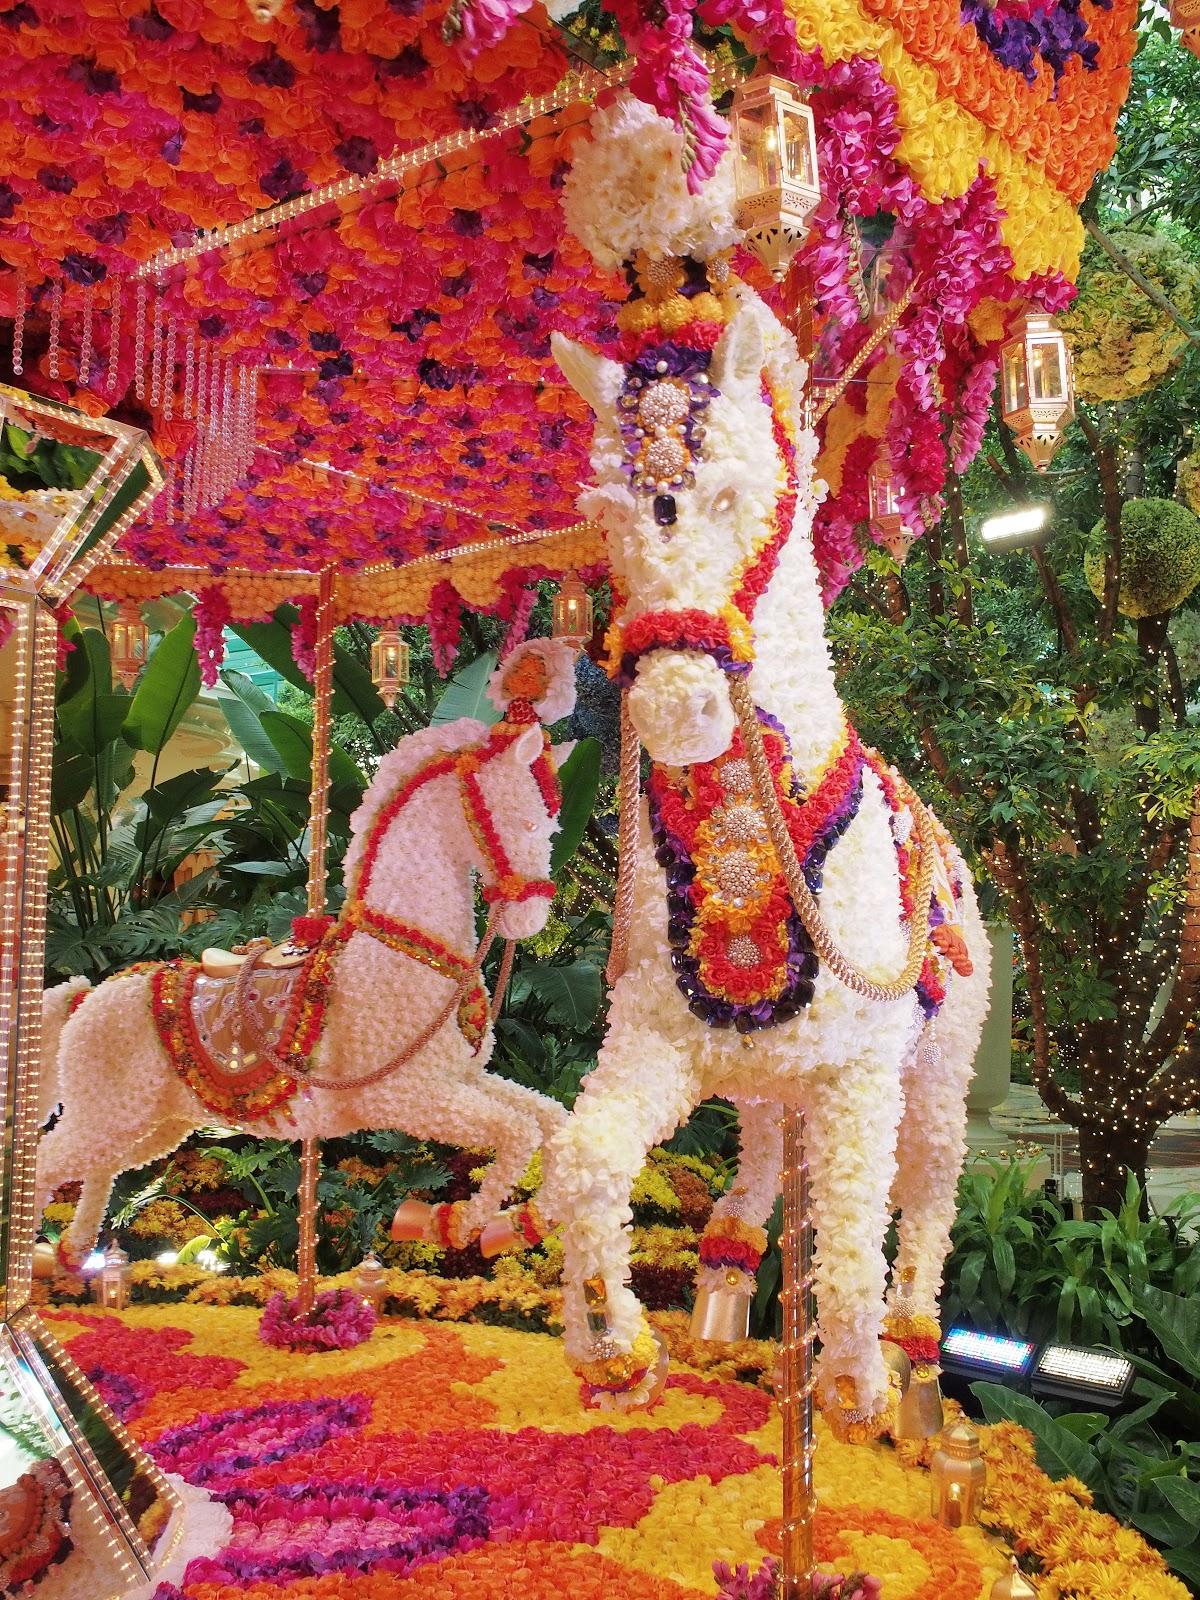 Carousel Horse, #carousel #horse #wynn #lasvegas #flowers #carouselhorse